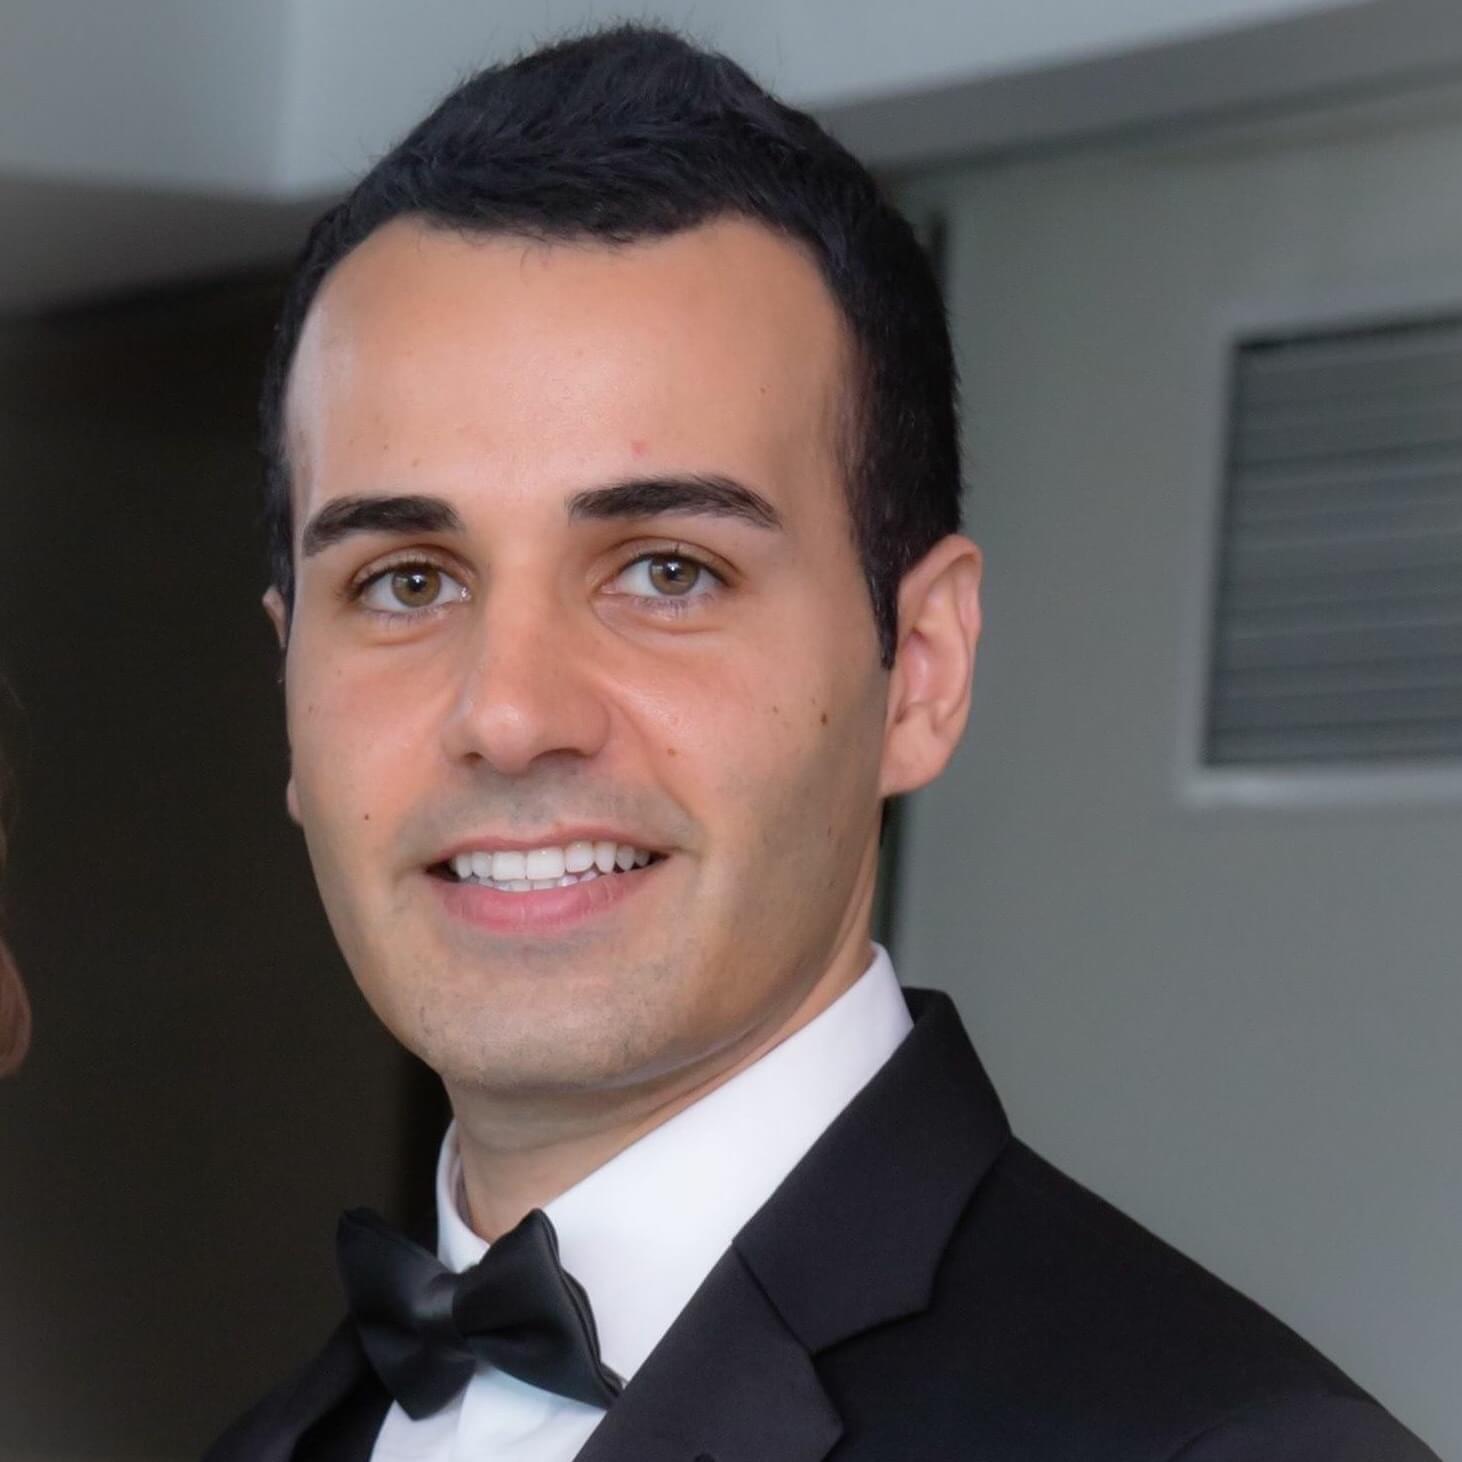 Dr. Sina Edalat, DDS